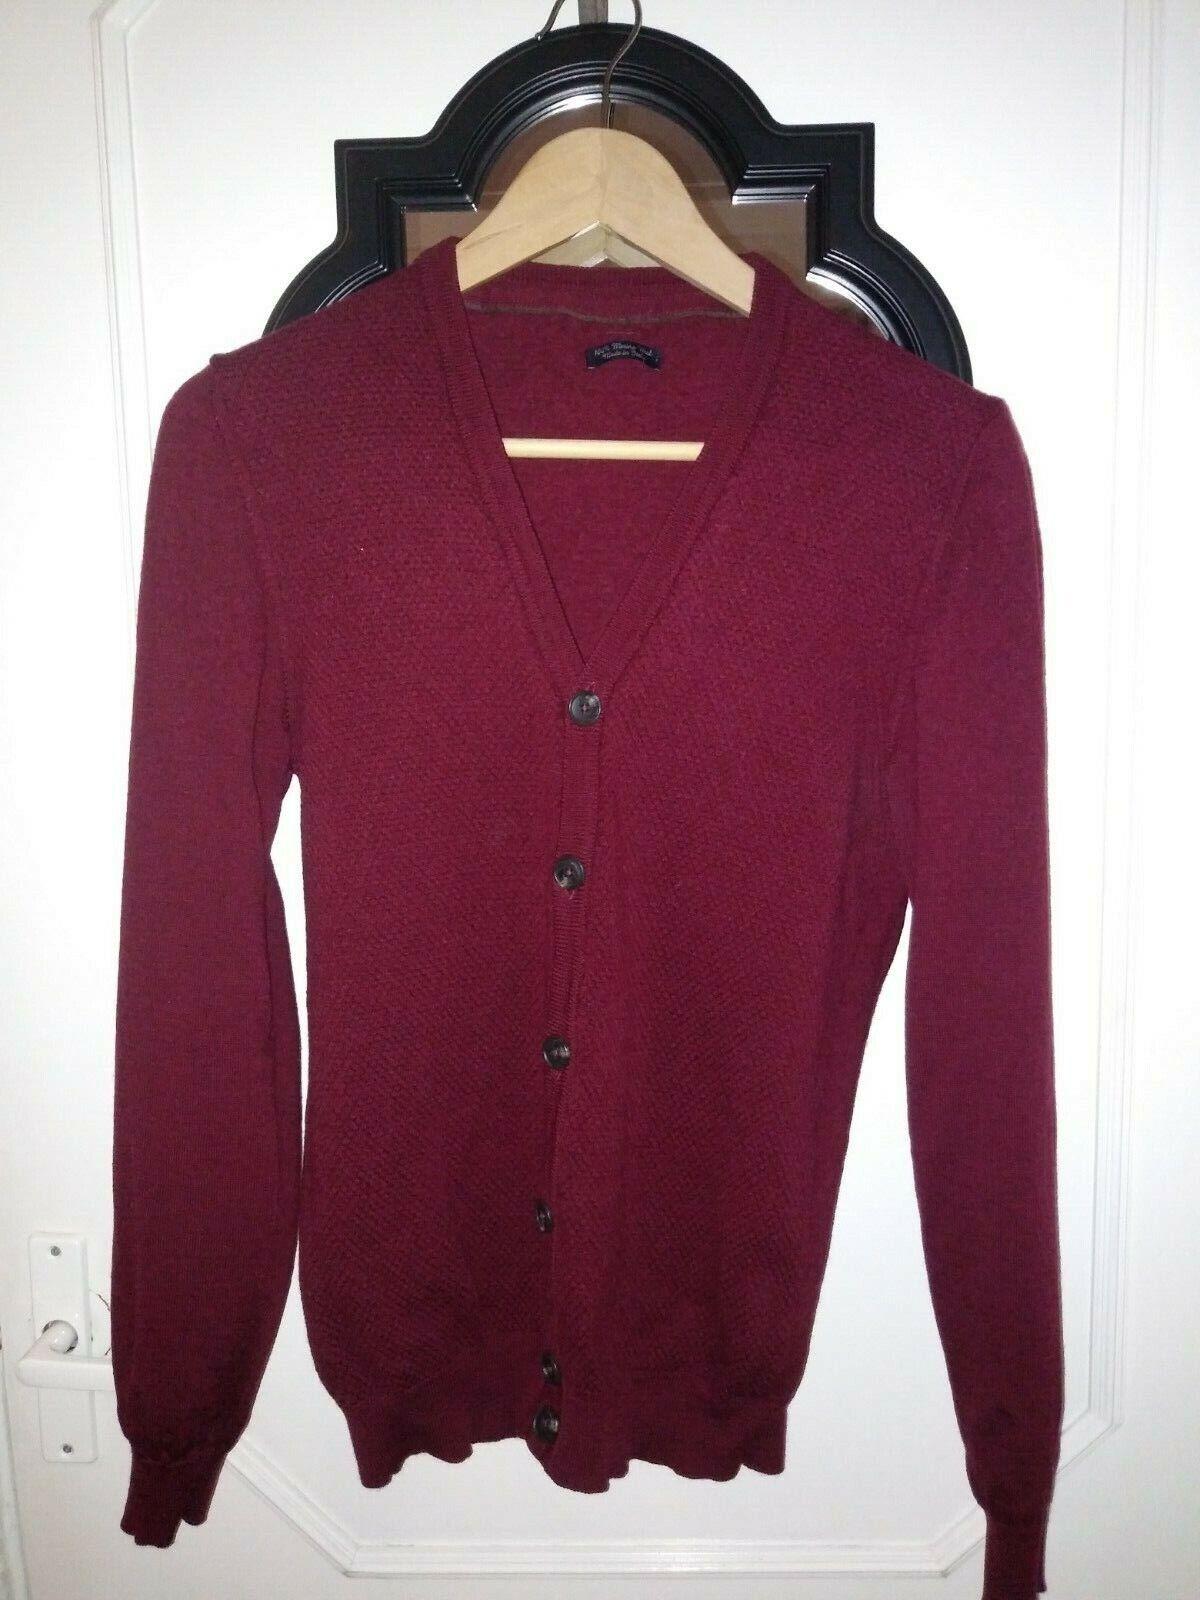 McGregor 100% Merino Wool Cardigan in Burgundy colour Size S